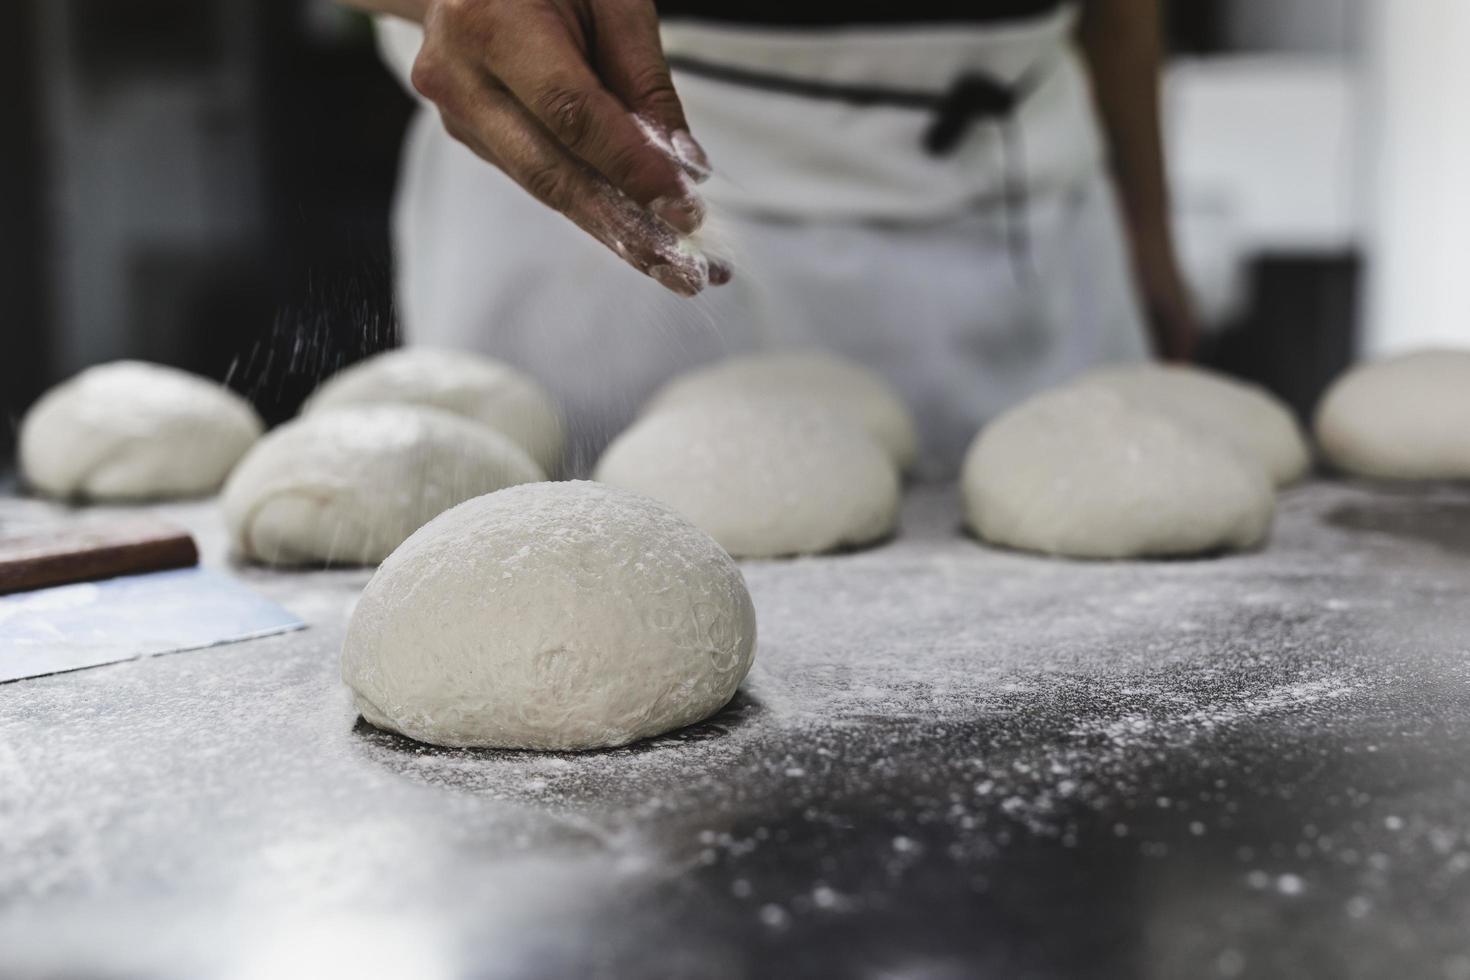 Chef sprinkling flour on dough photo